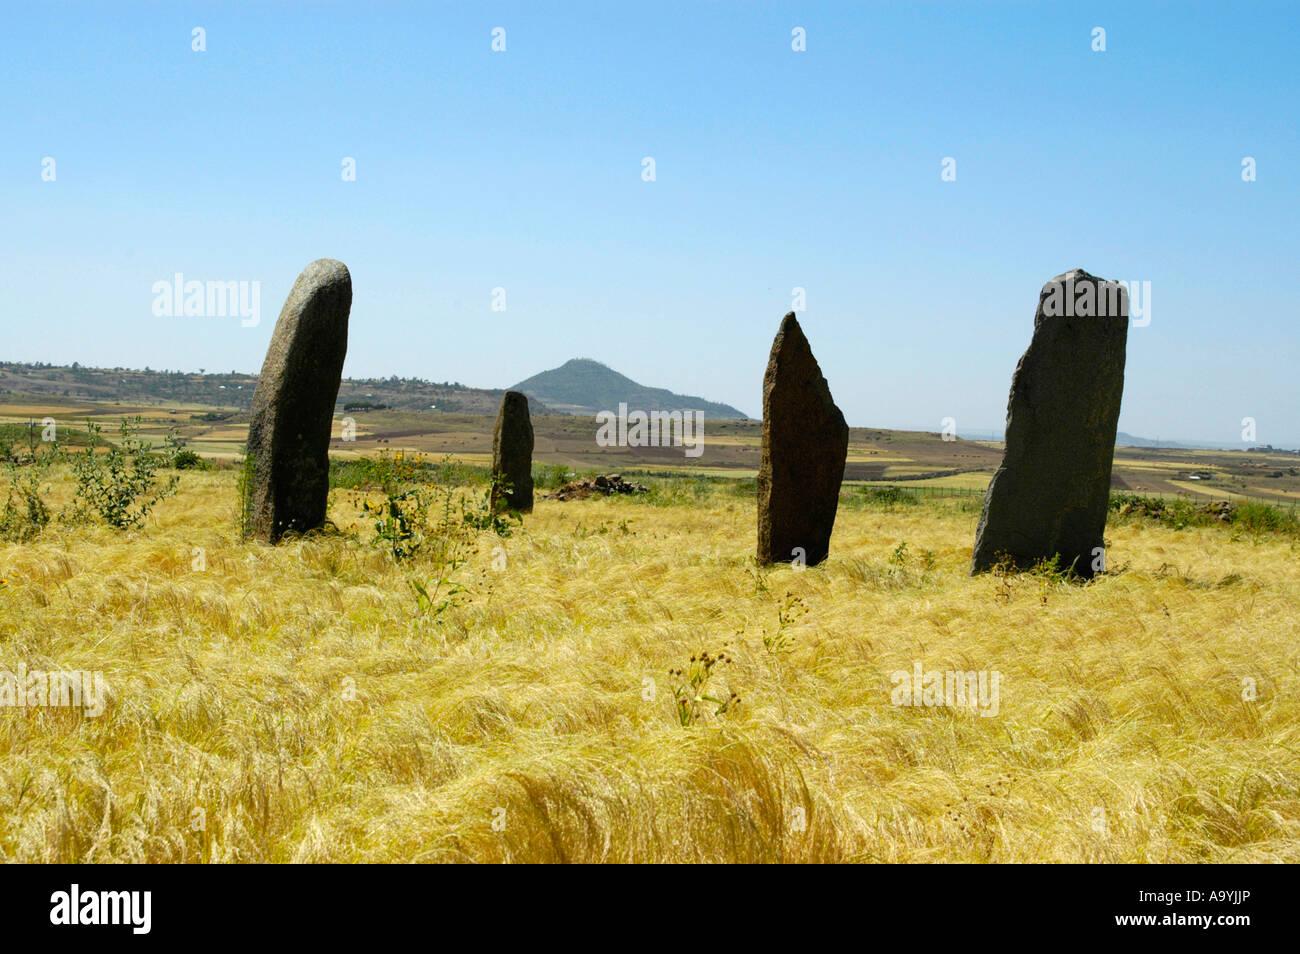 Four steles in the stele field of Gwudit Judith in fields of teff Aksum Ethiopia - Stock Image